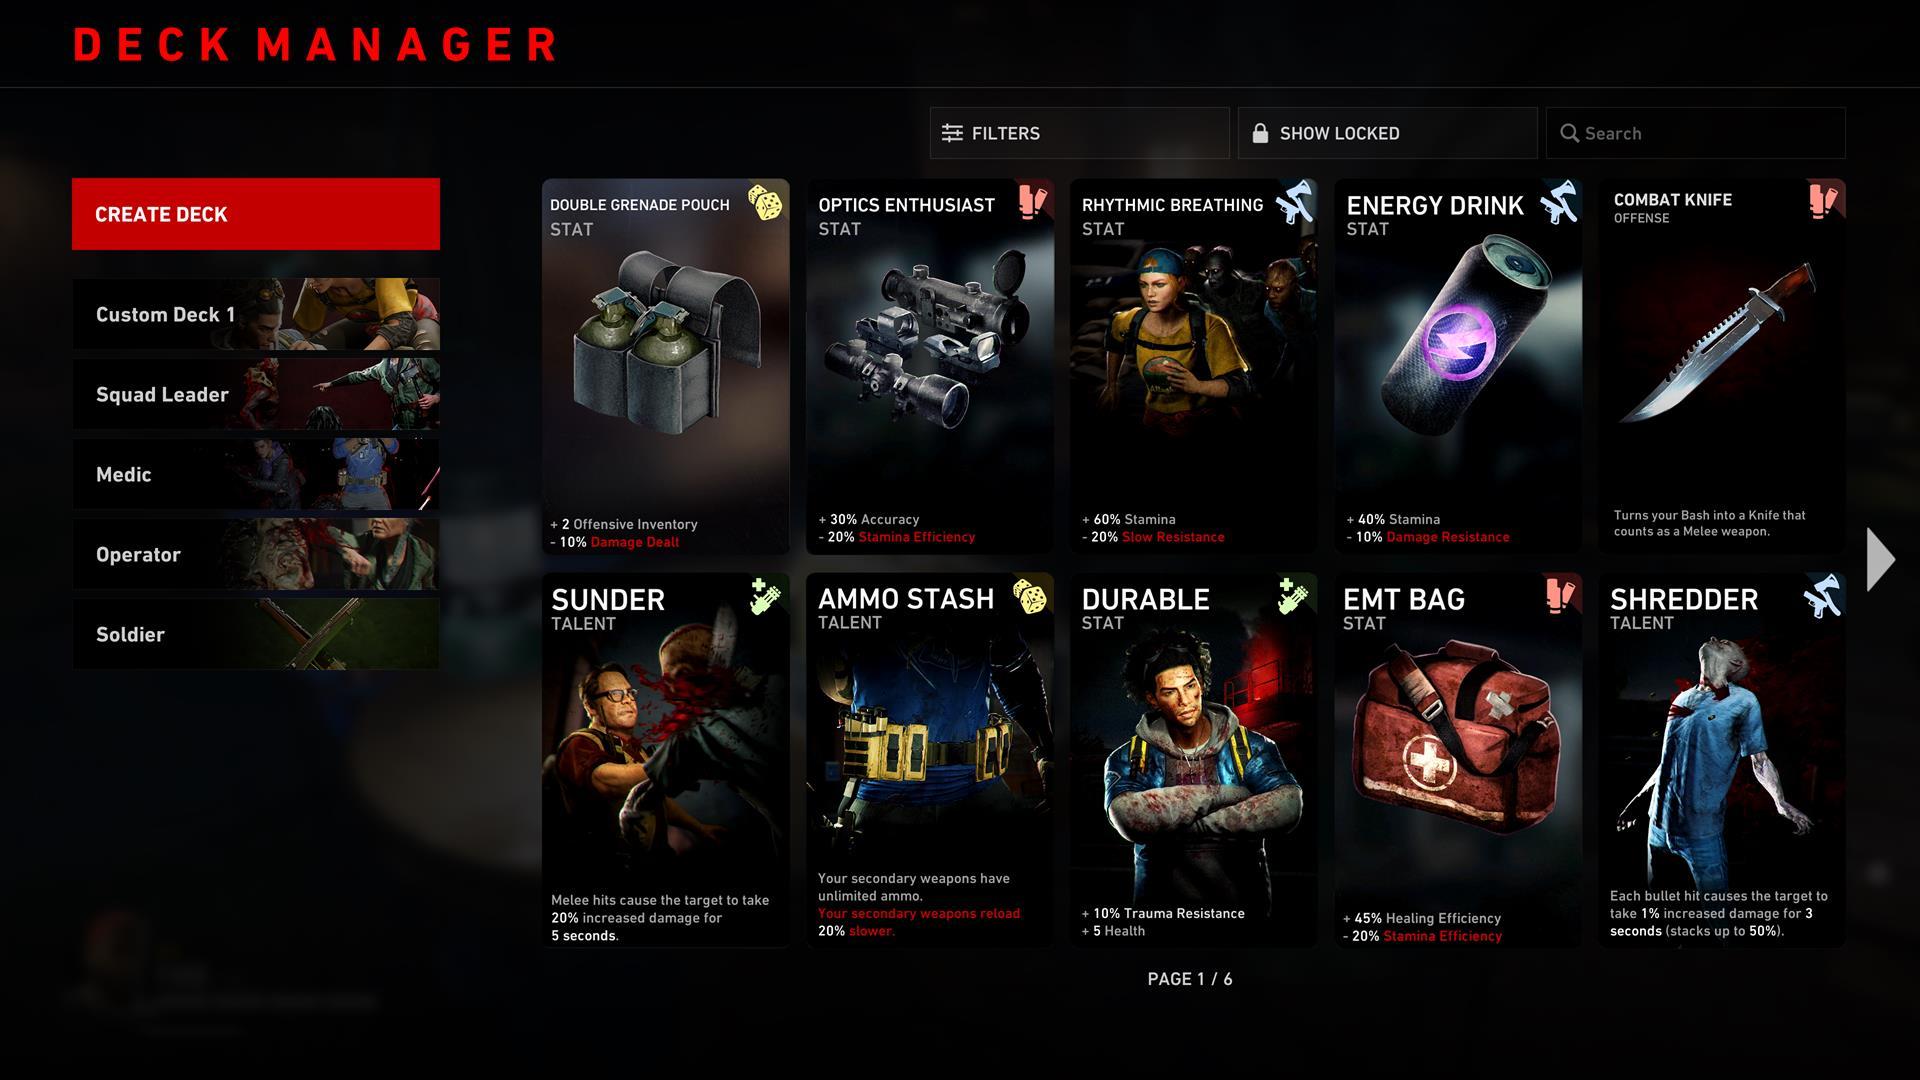 Back 4 Blood's card system